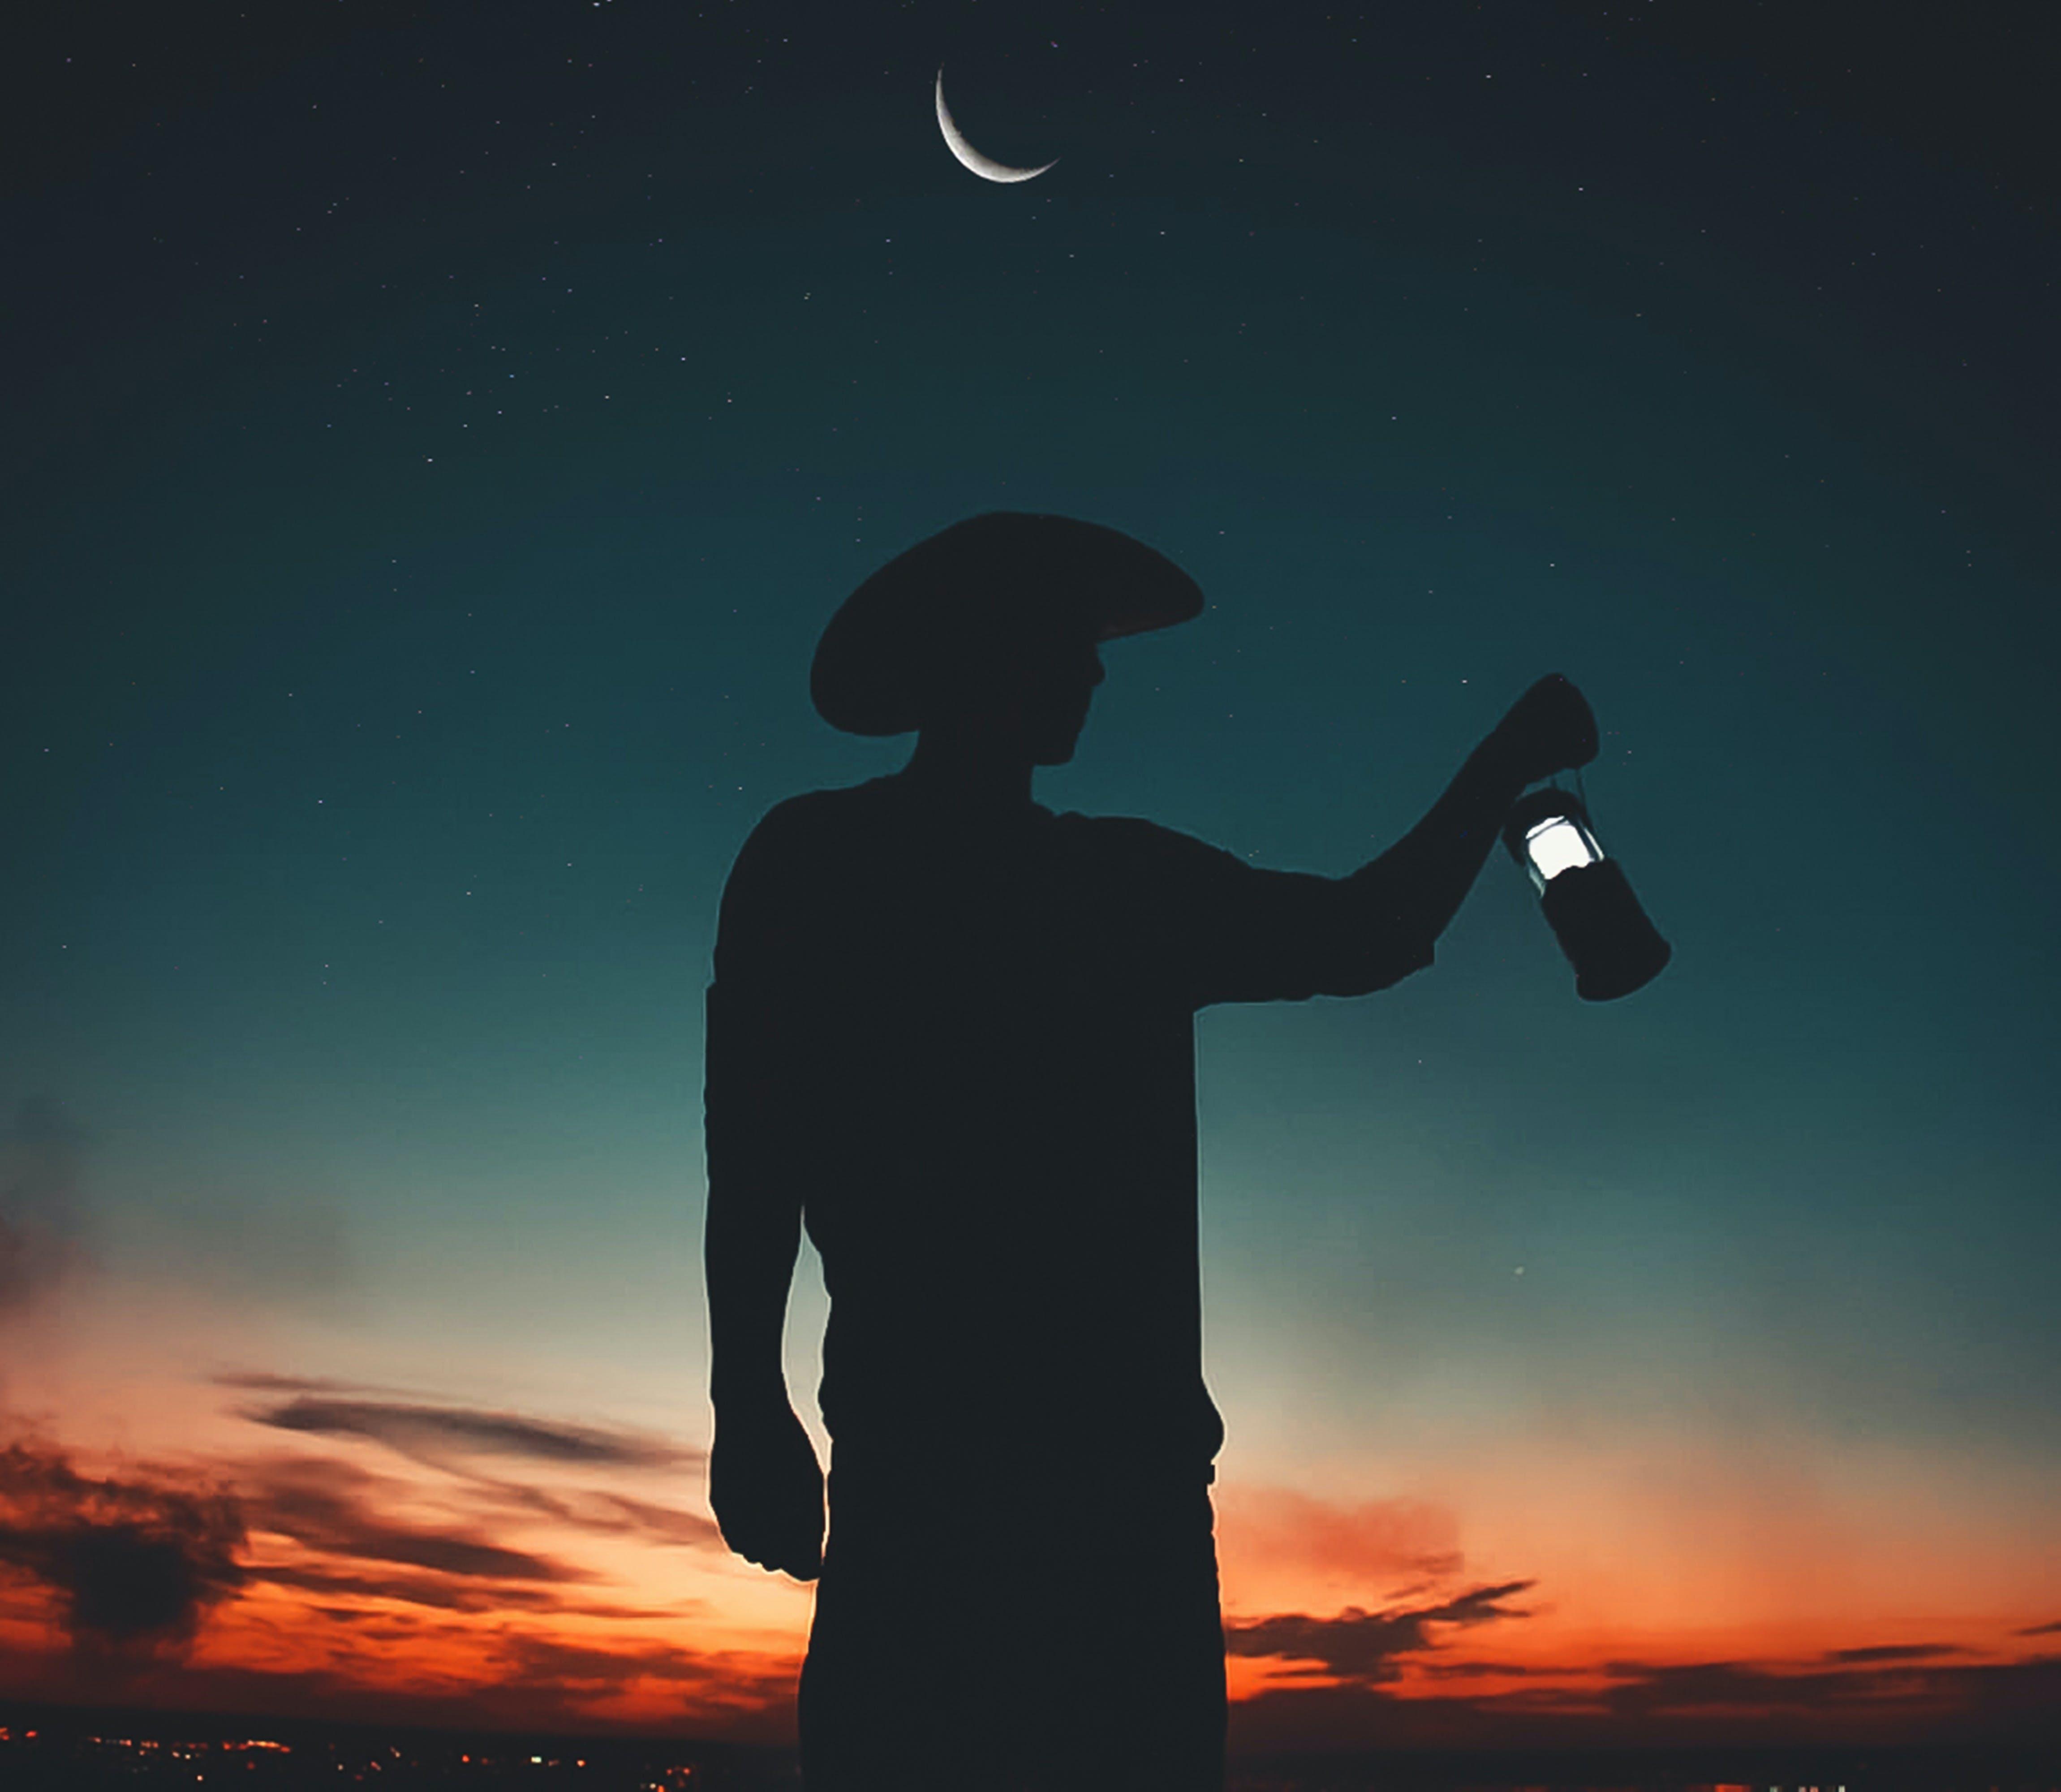 Silhouette Photo Of Man Holding Light Lantern